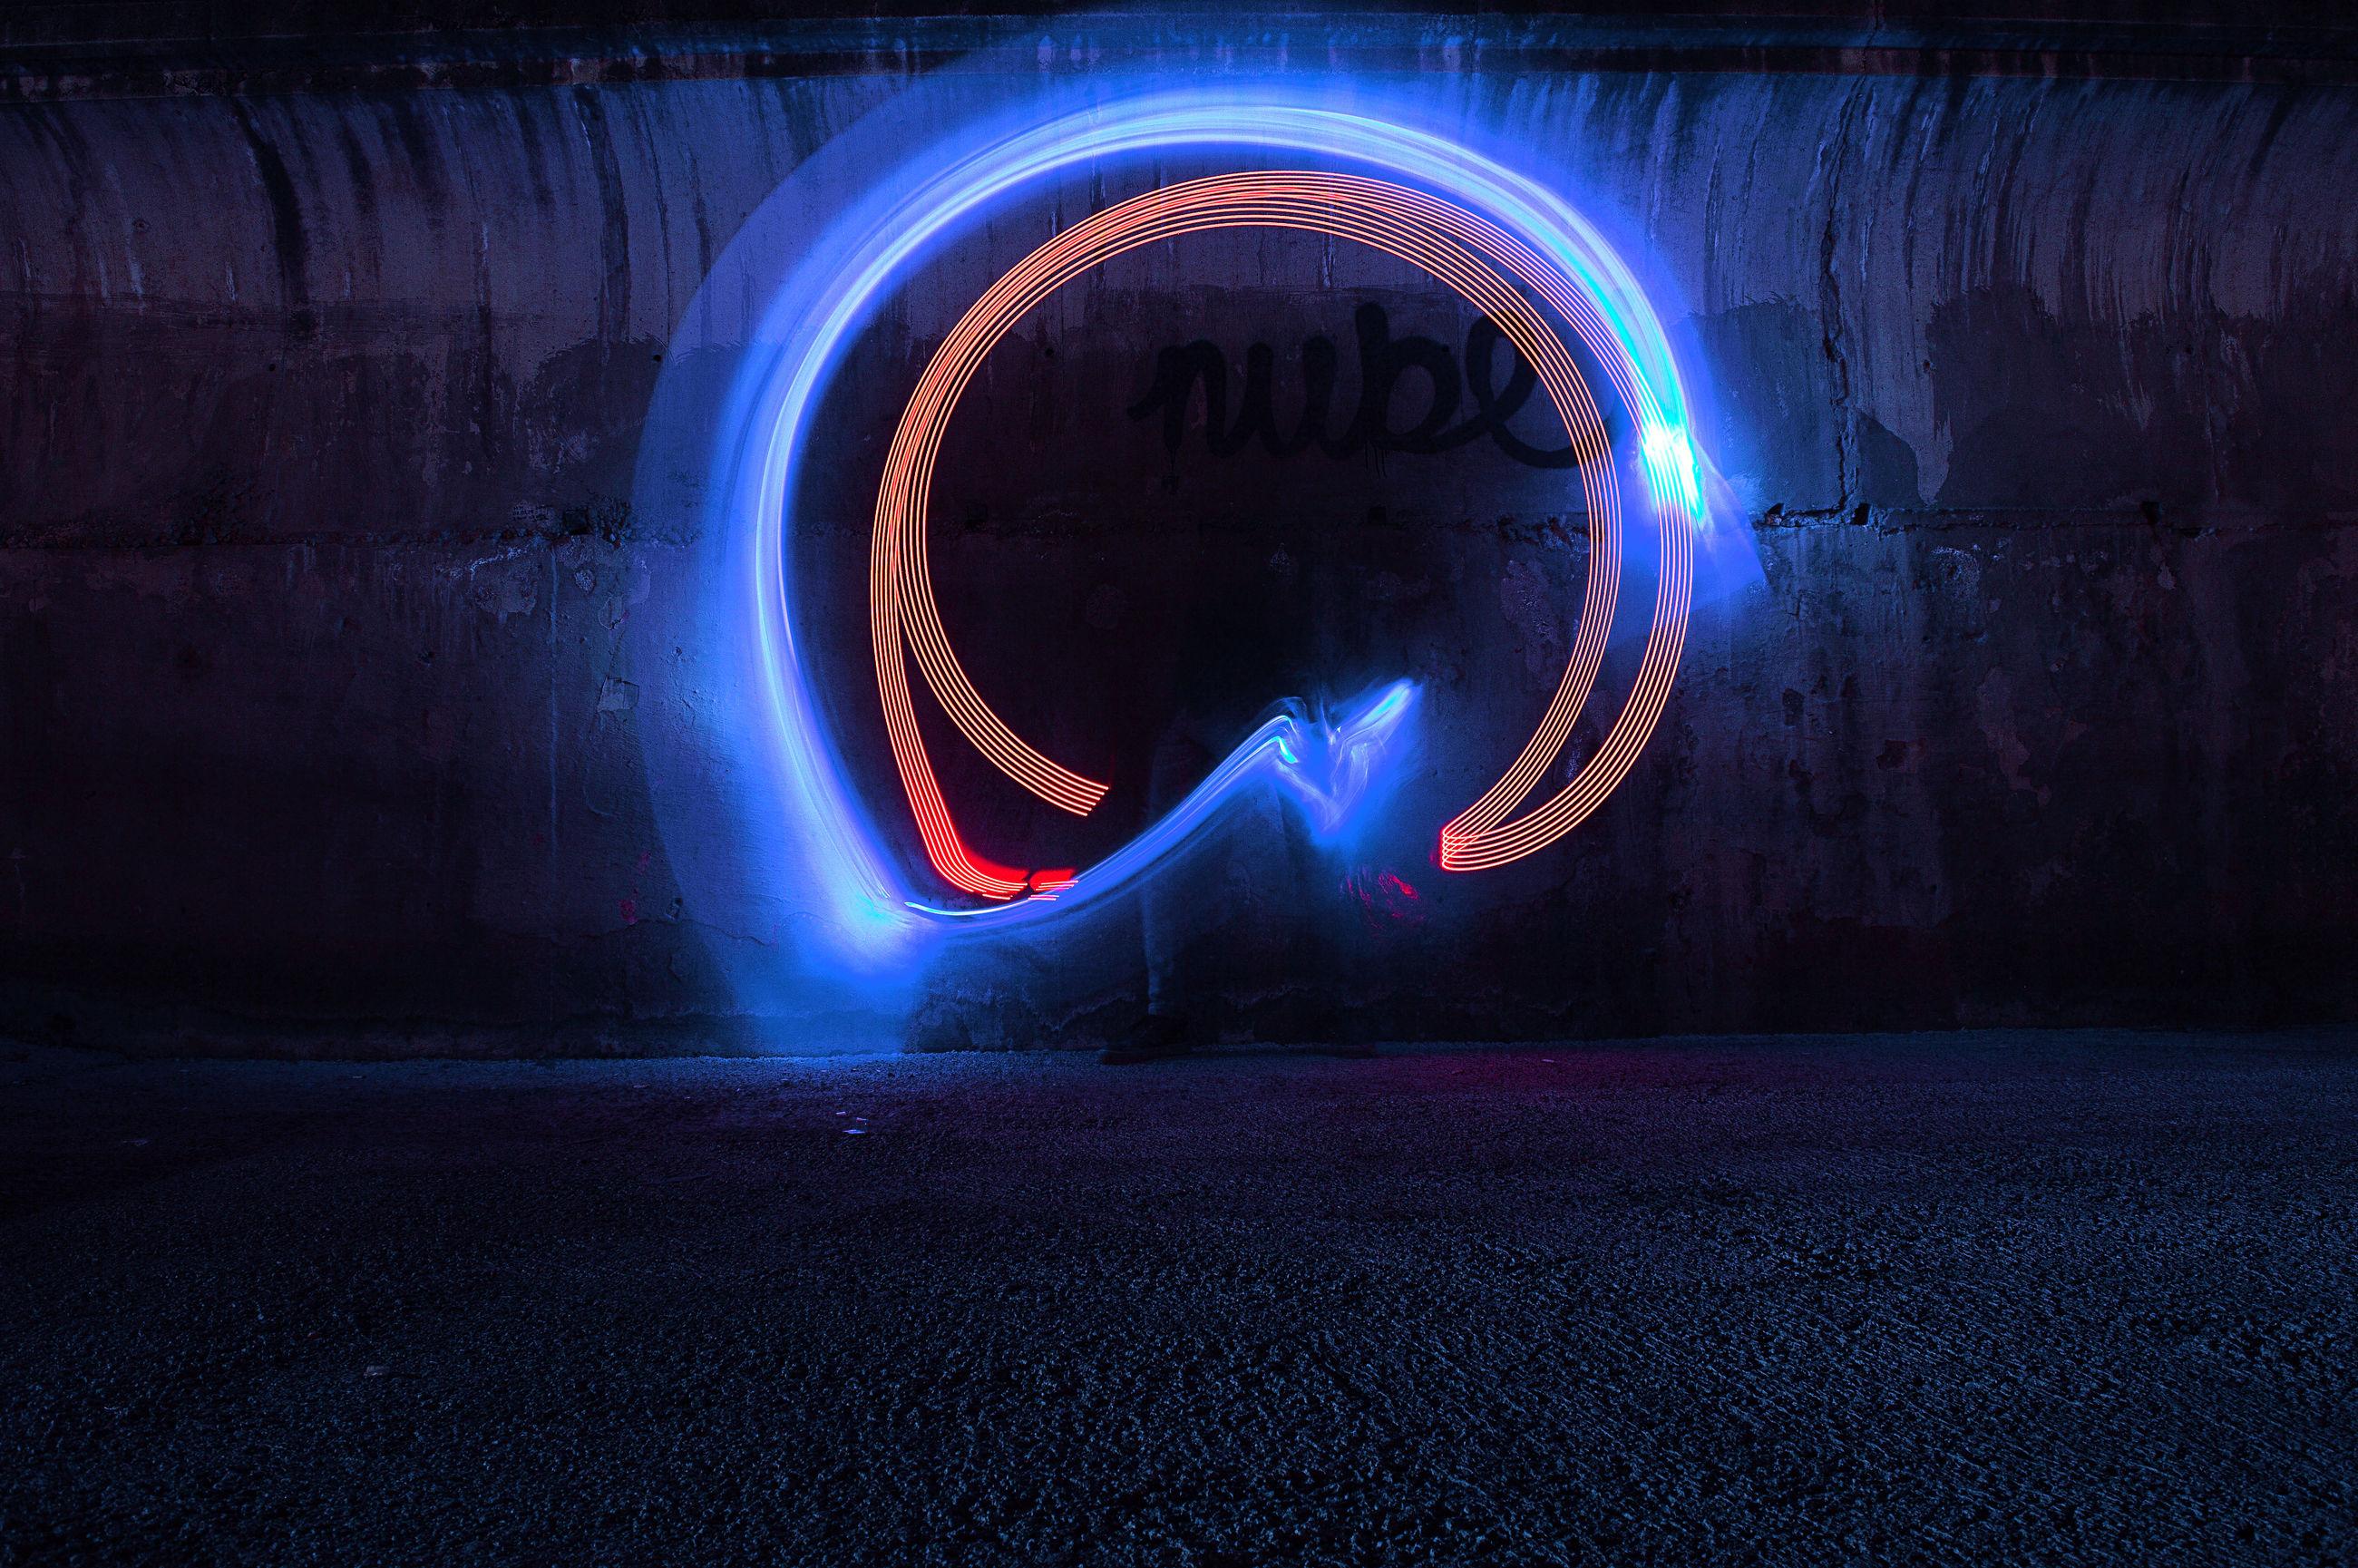 illuminated, long exposure, glowing, night, light painting, motion, light trail, circle, light - natural phenomenon, blurred motion, wire wool, speed, architecture, geometric shape, spinning, no people, creativity, city, shape, communication, light